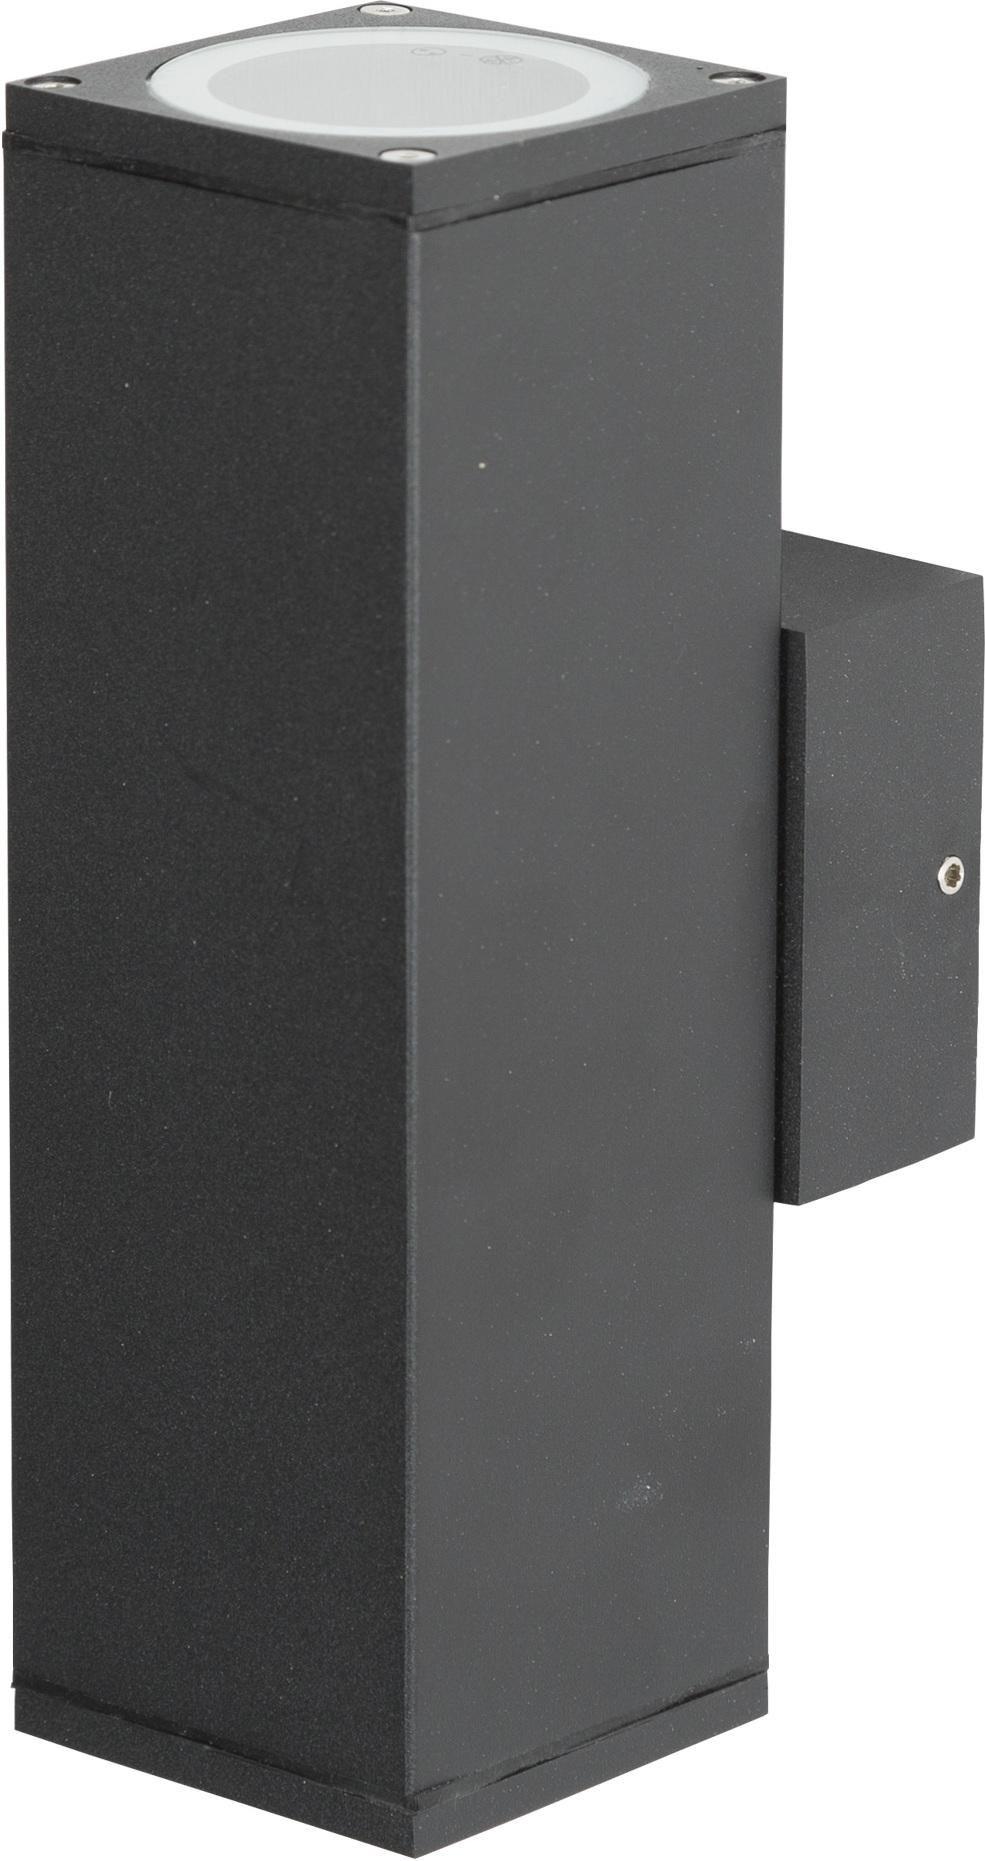 au en wandlampe kelvin up down aluminium schwarz ks verlichting kaufen lilianshouse. Black Bedroom Furniture Sets. Home Design Ideas